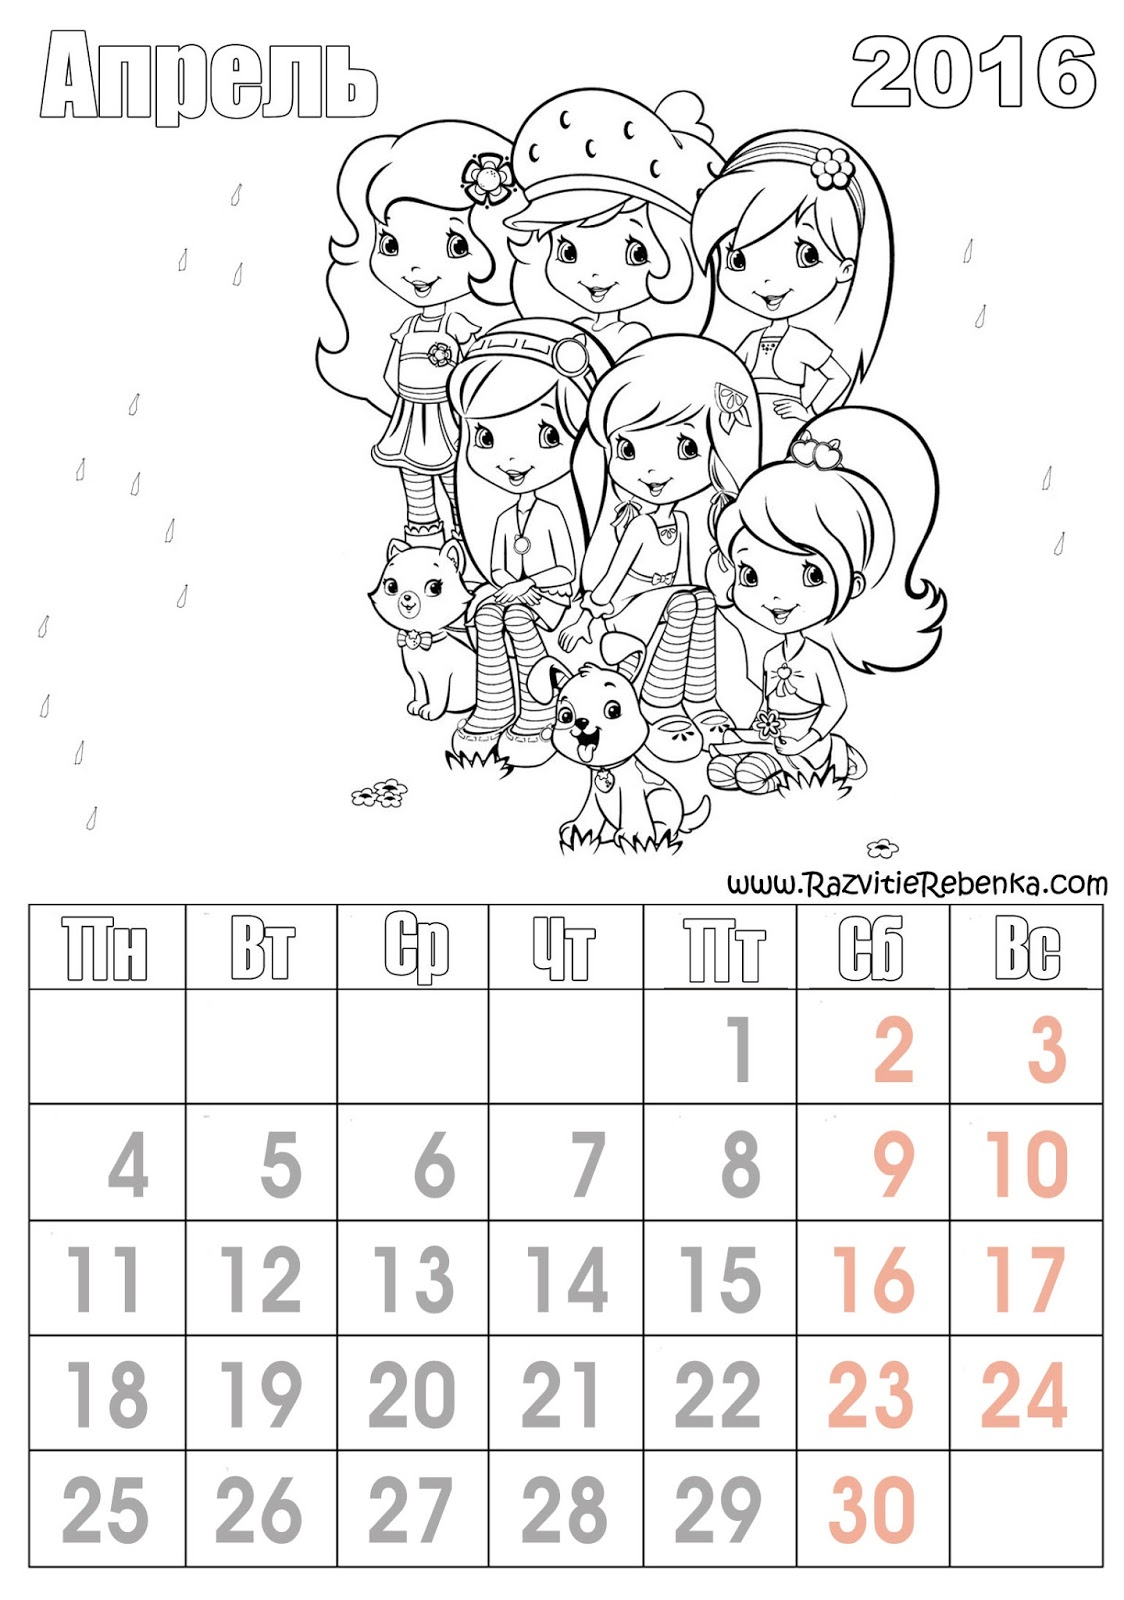 Фоны на календари 2015